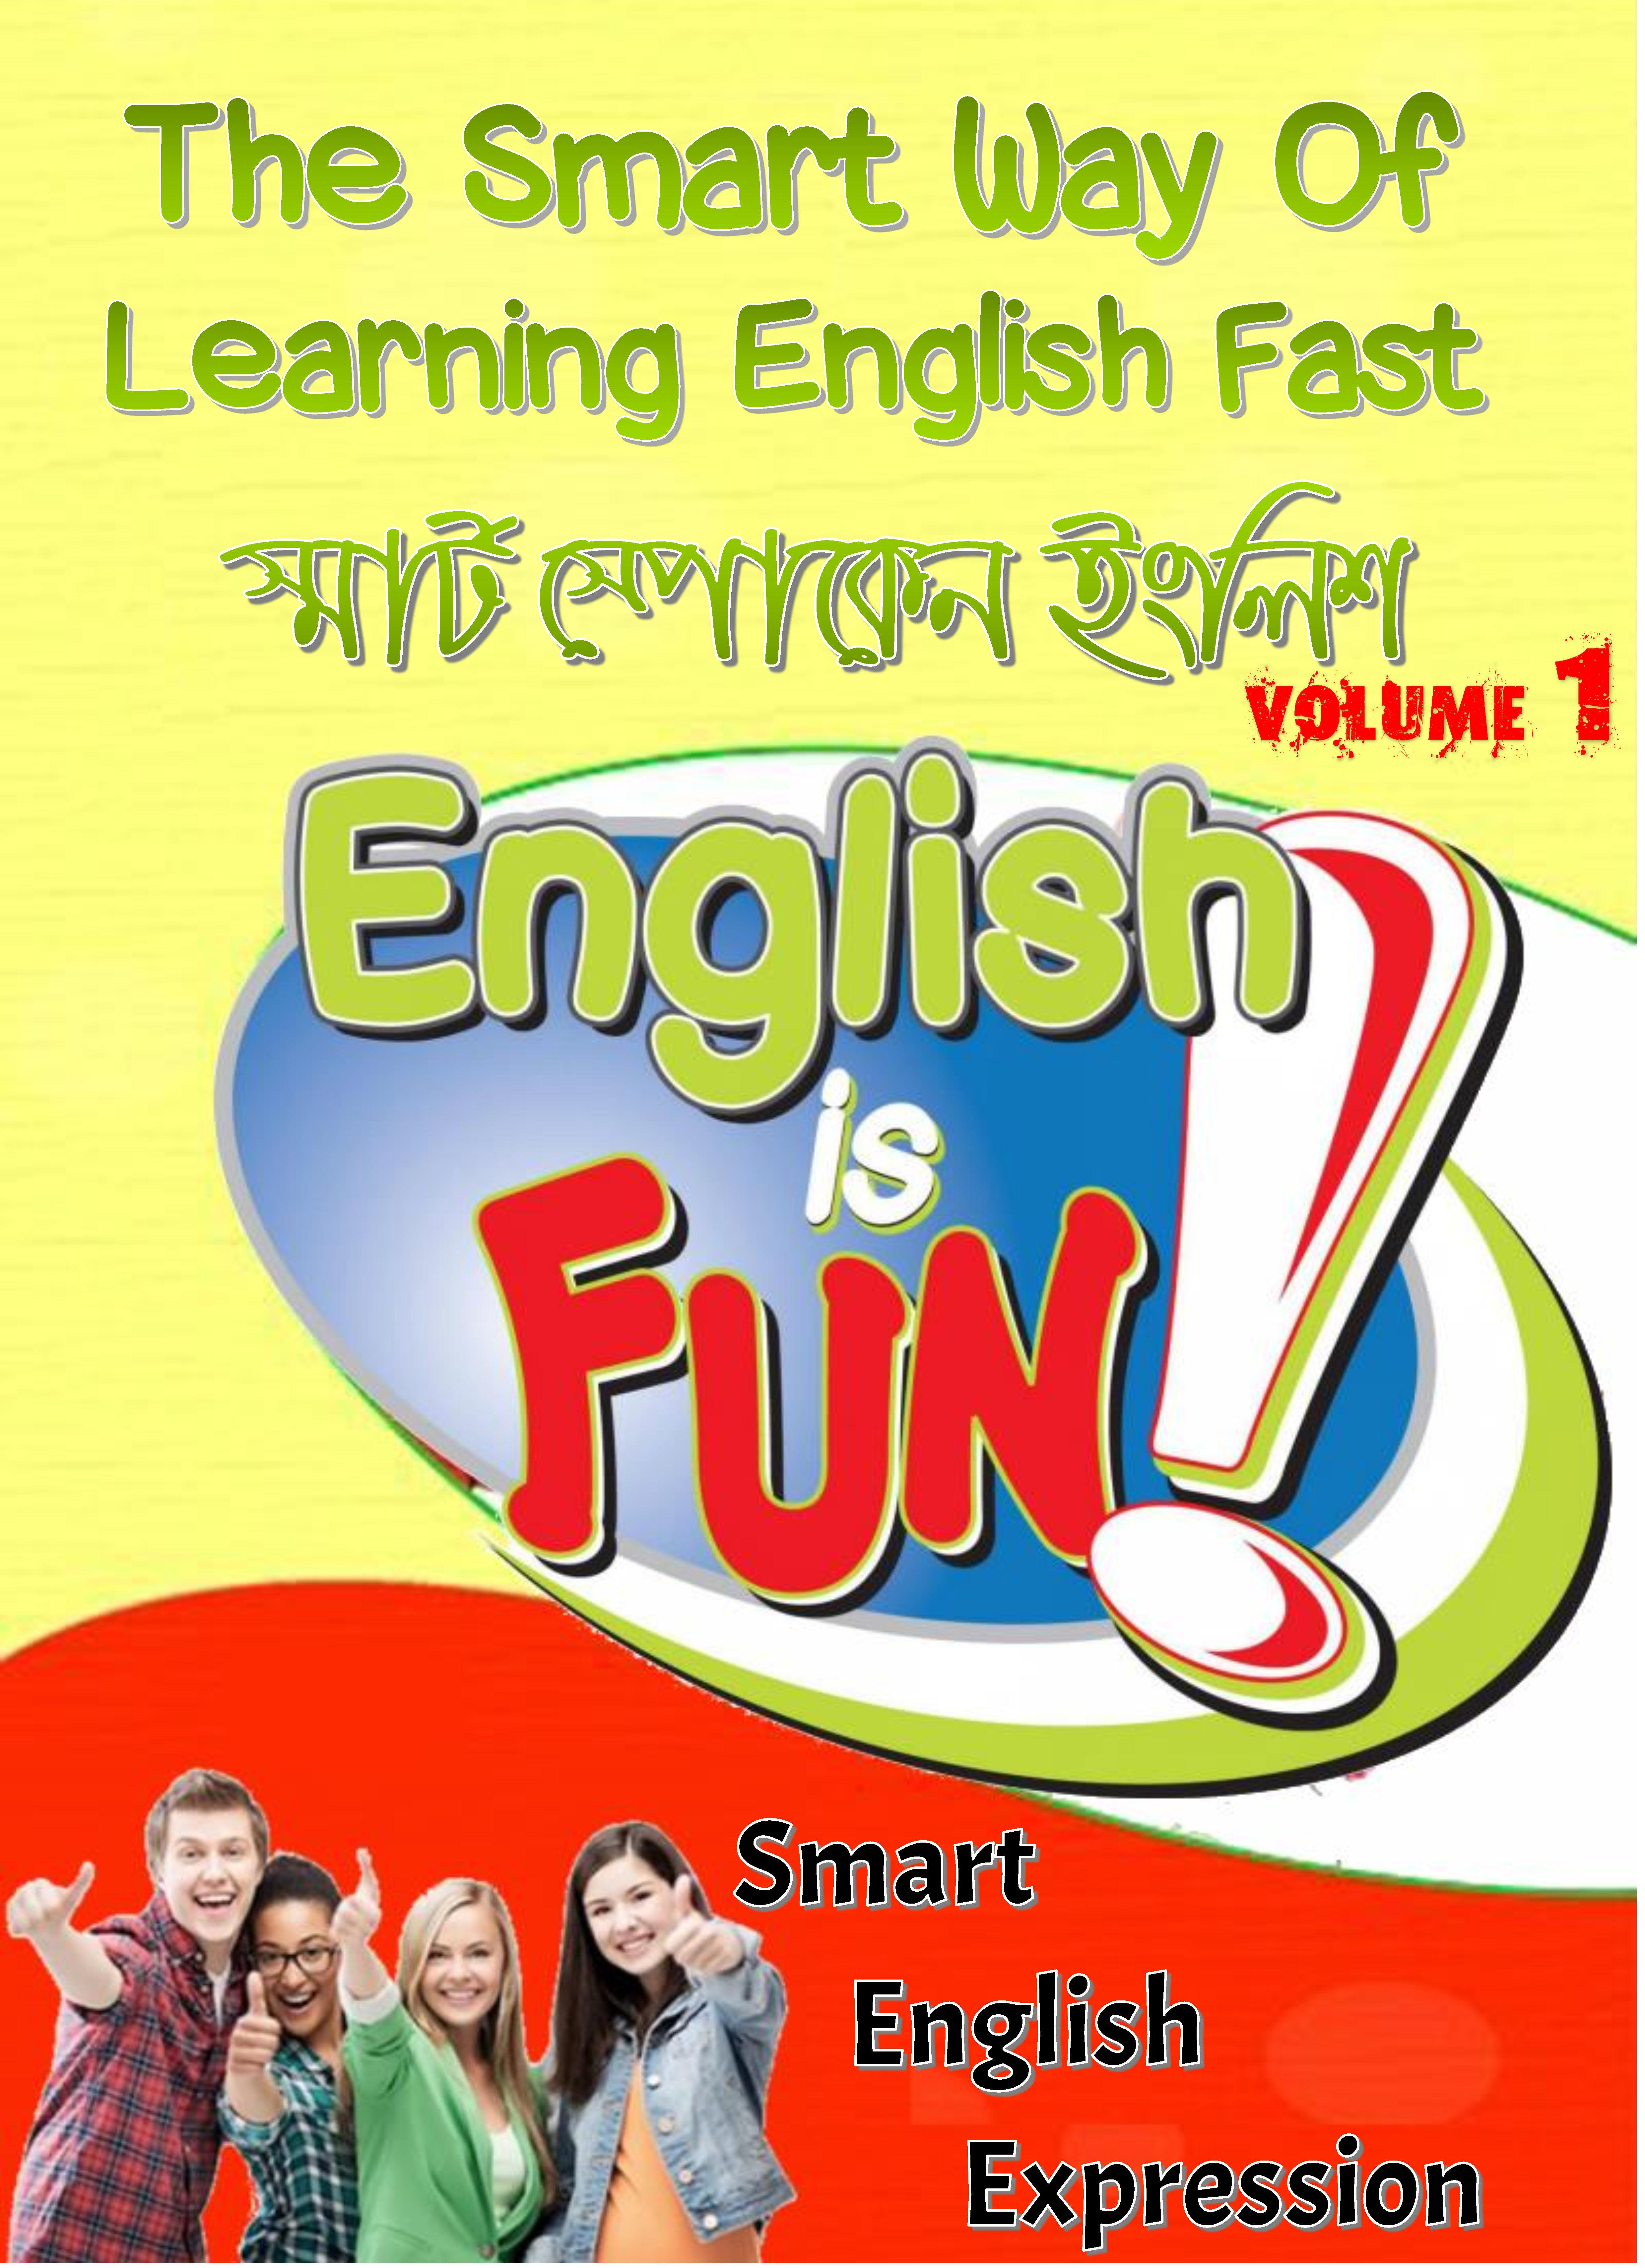 The Smart Way Of Learning English Fast - ইংলিশ স্পোকেন শেখার স্মার্ট উপায় পার্ট ১